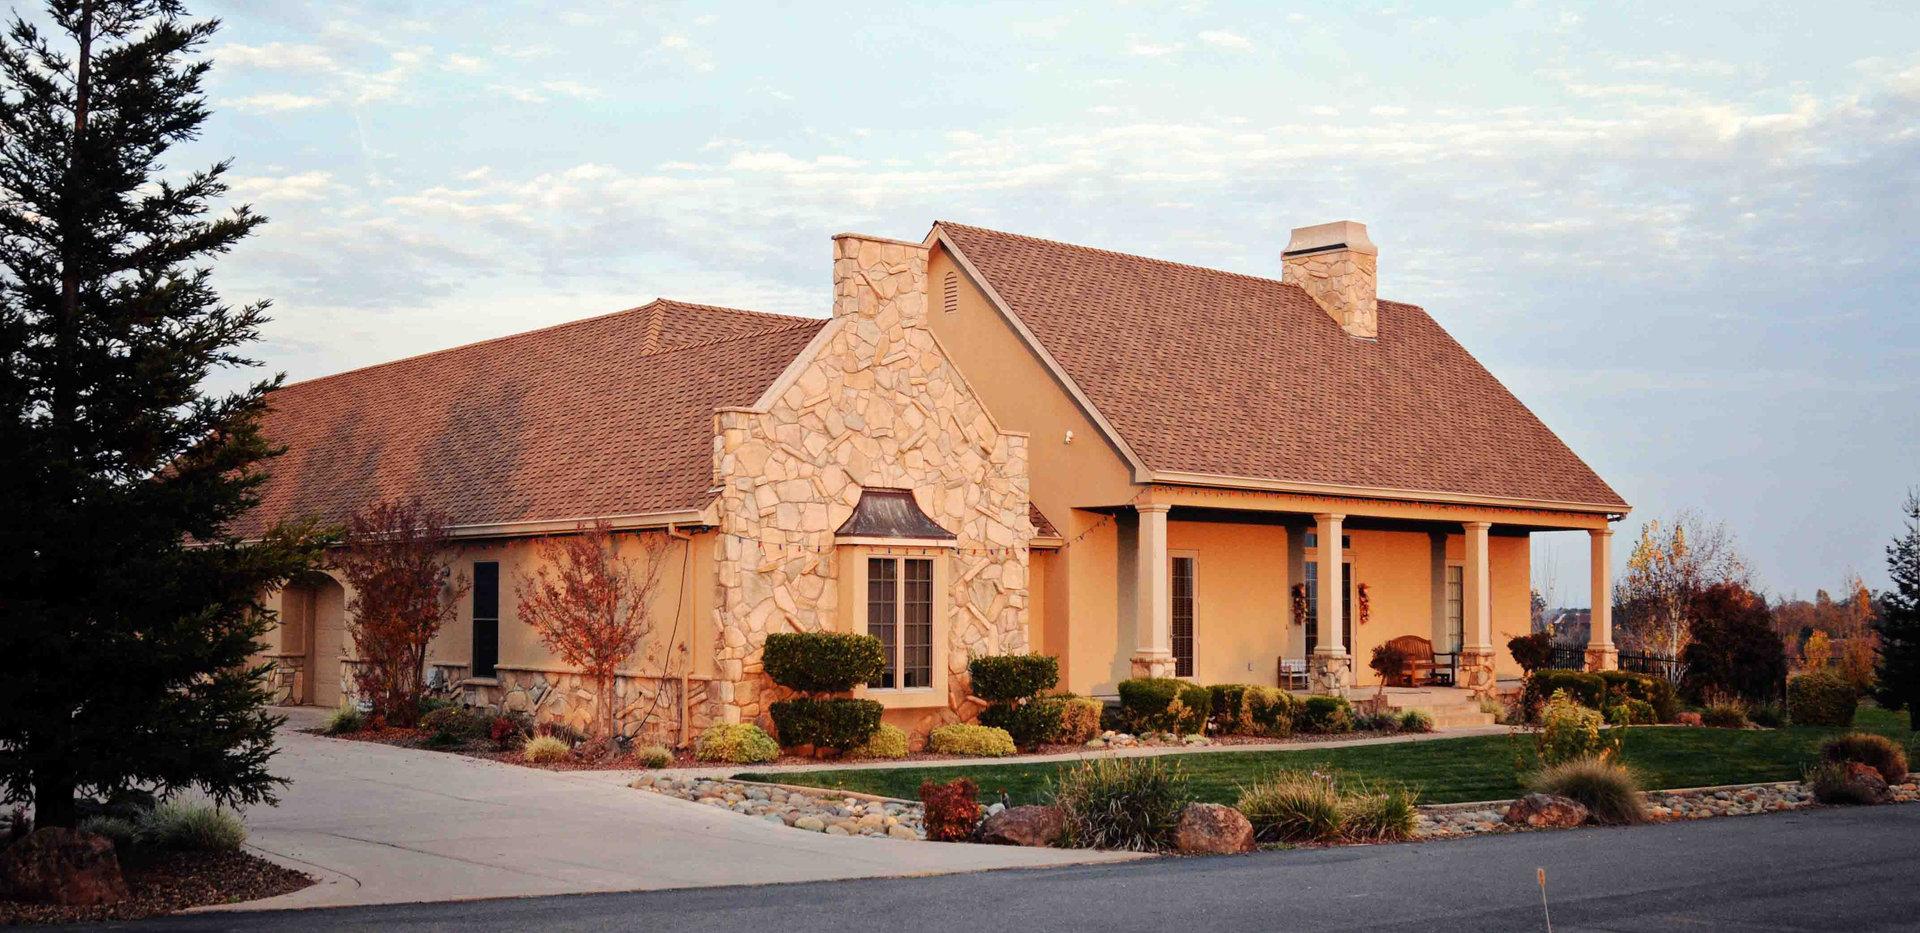 SVE house 4595.jpg